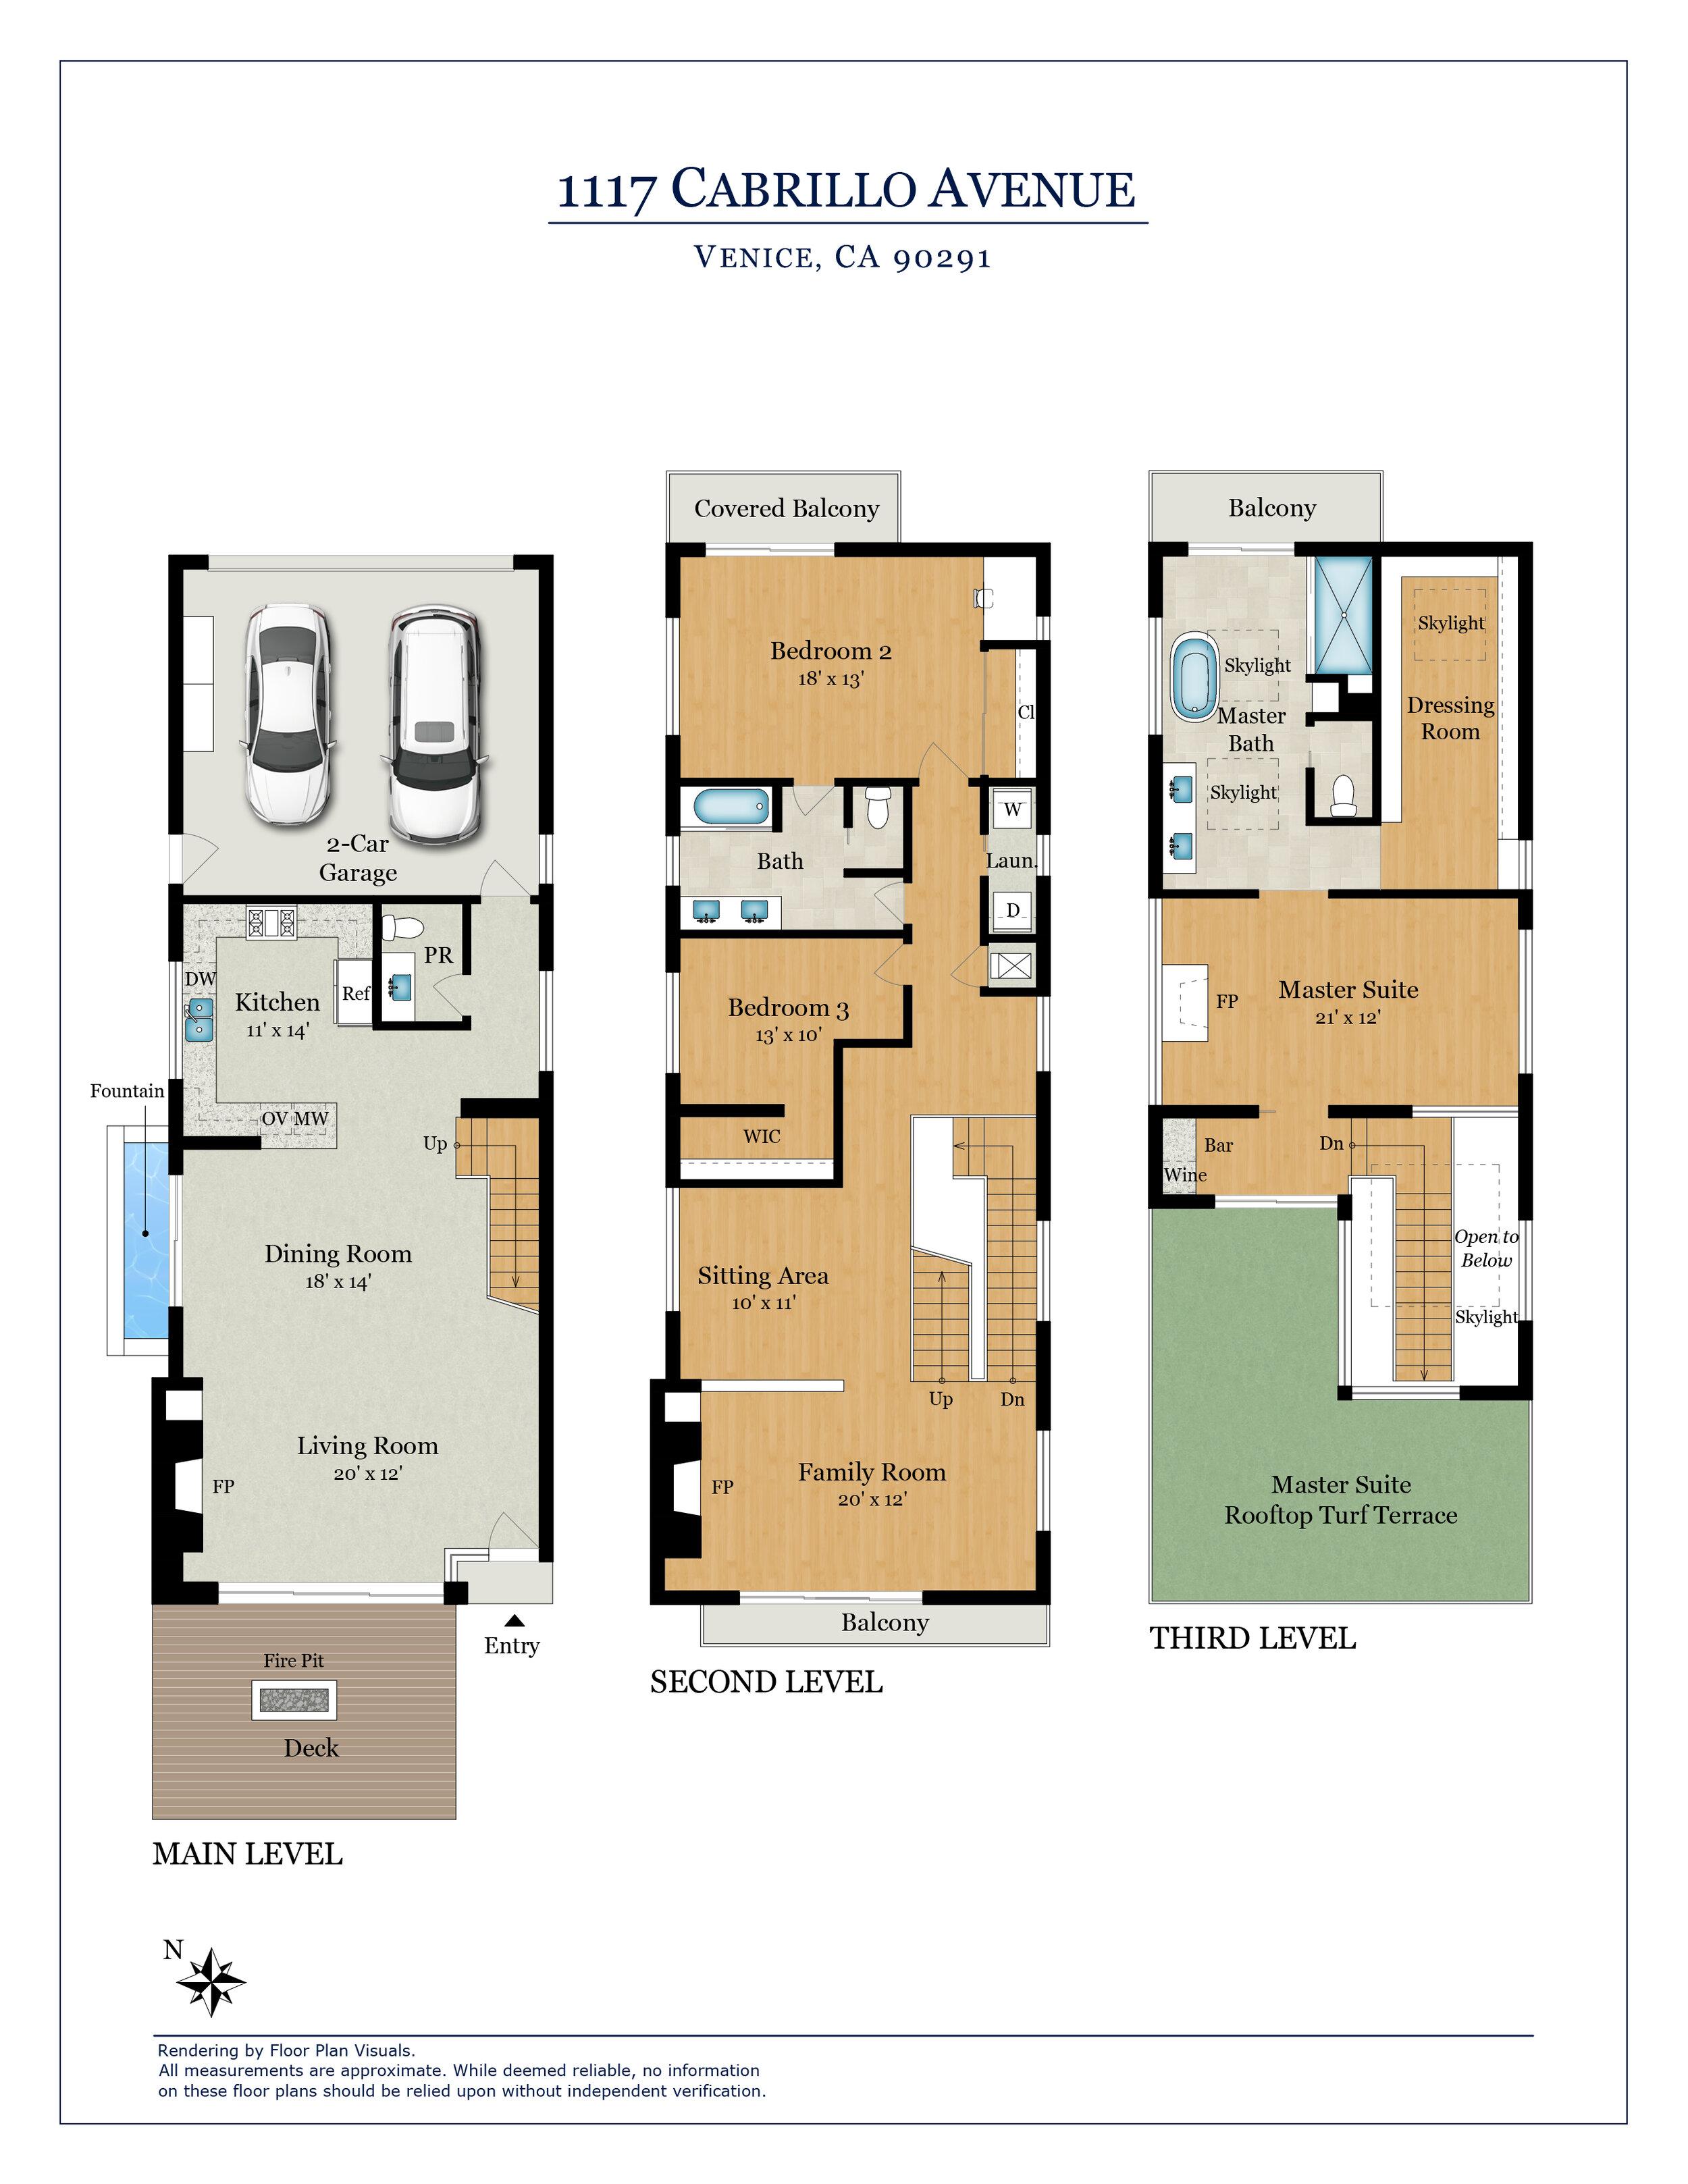 1117 Cabrillo Ave Floor Plan.jpg